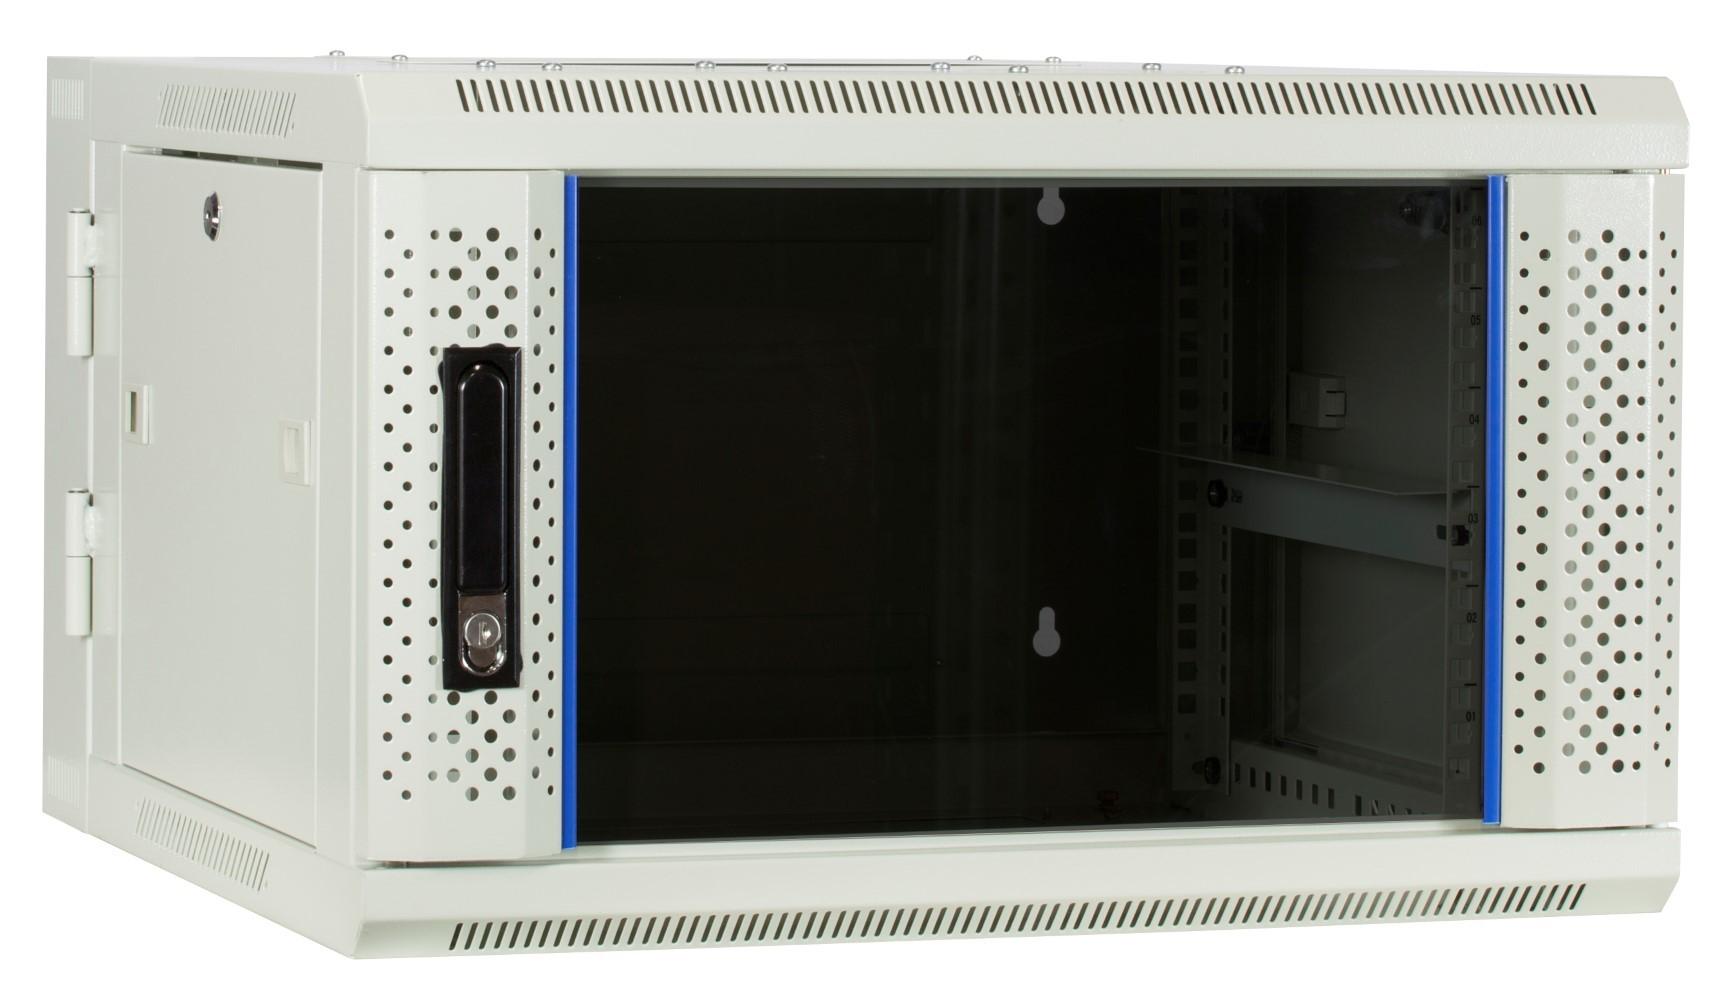 Afbeelding van 6U witte wandkast (kantelbaar) met glazen deur 600x600x368mm